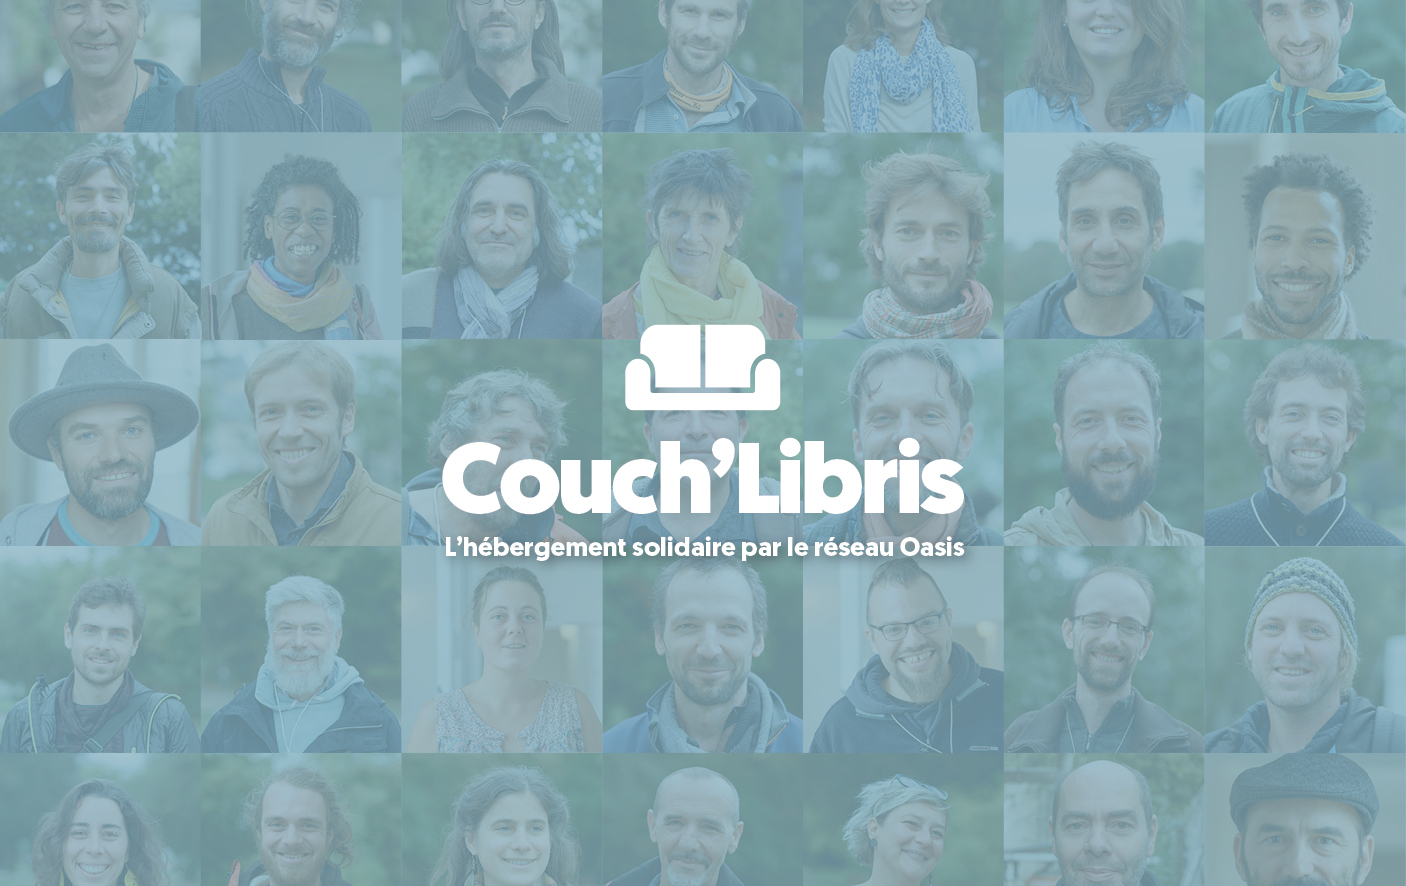 image Couchlibris.jpg (0.6MB)